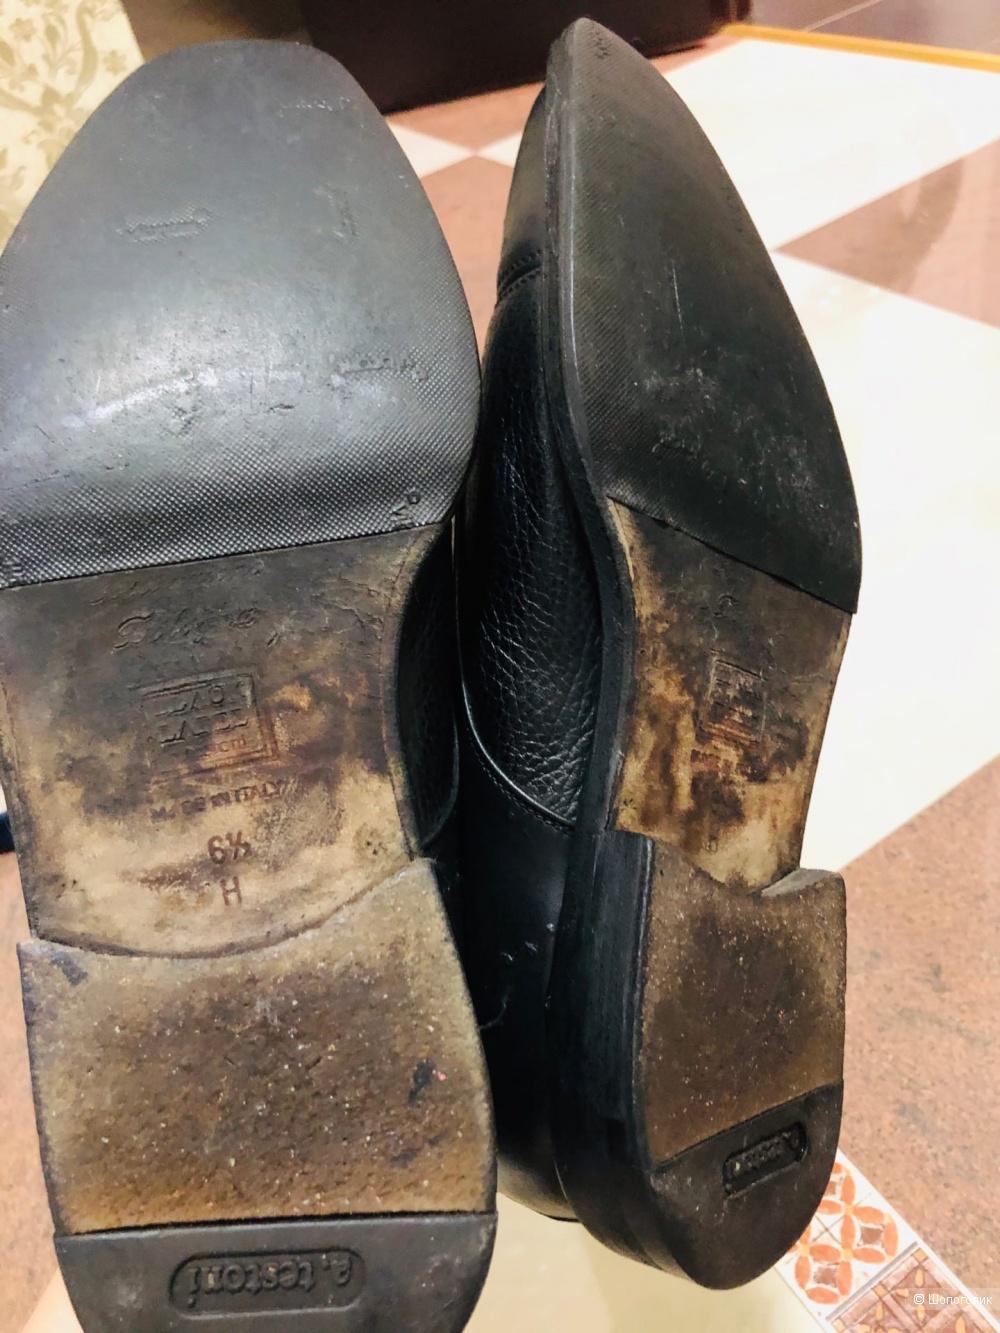 Туфли-броги A.TESTONI.Размер 40-41.